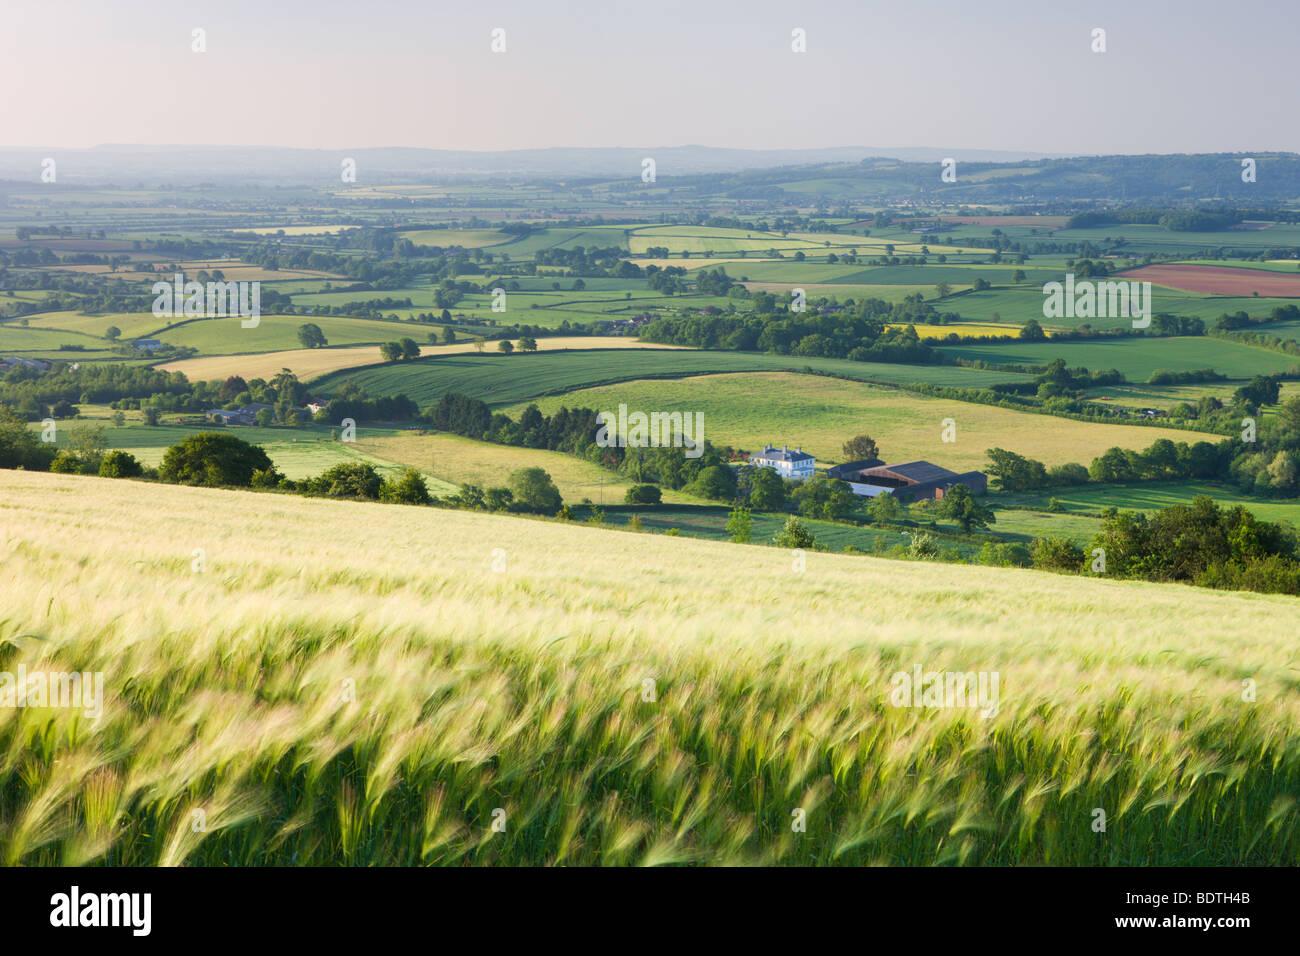 Barley crop field and rolling Devon landscape near Crediton, Devon, England. Summer (June) 2009 - Stock Image